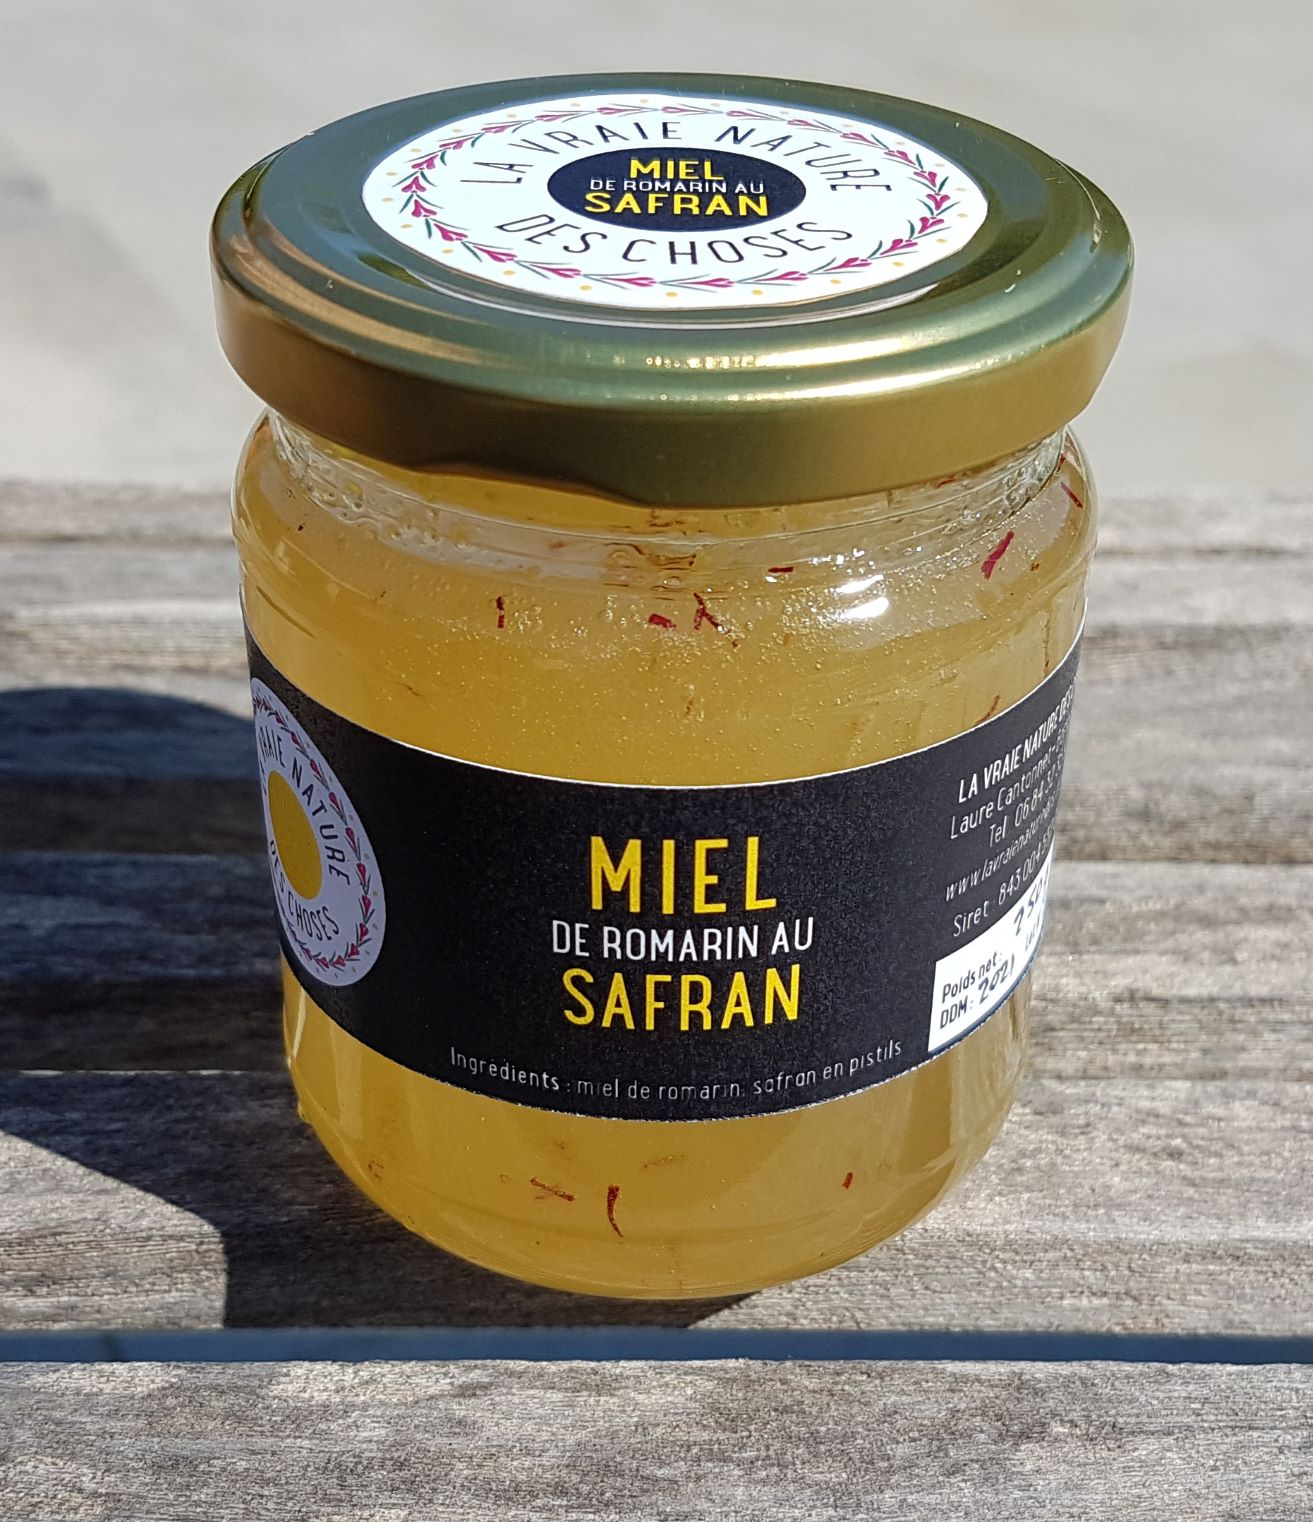 miel de romarin au safran